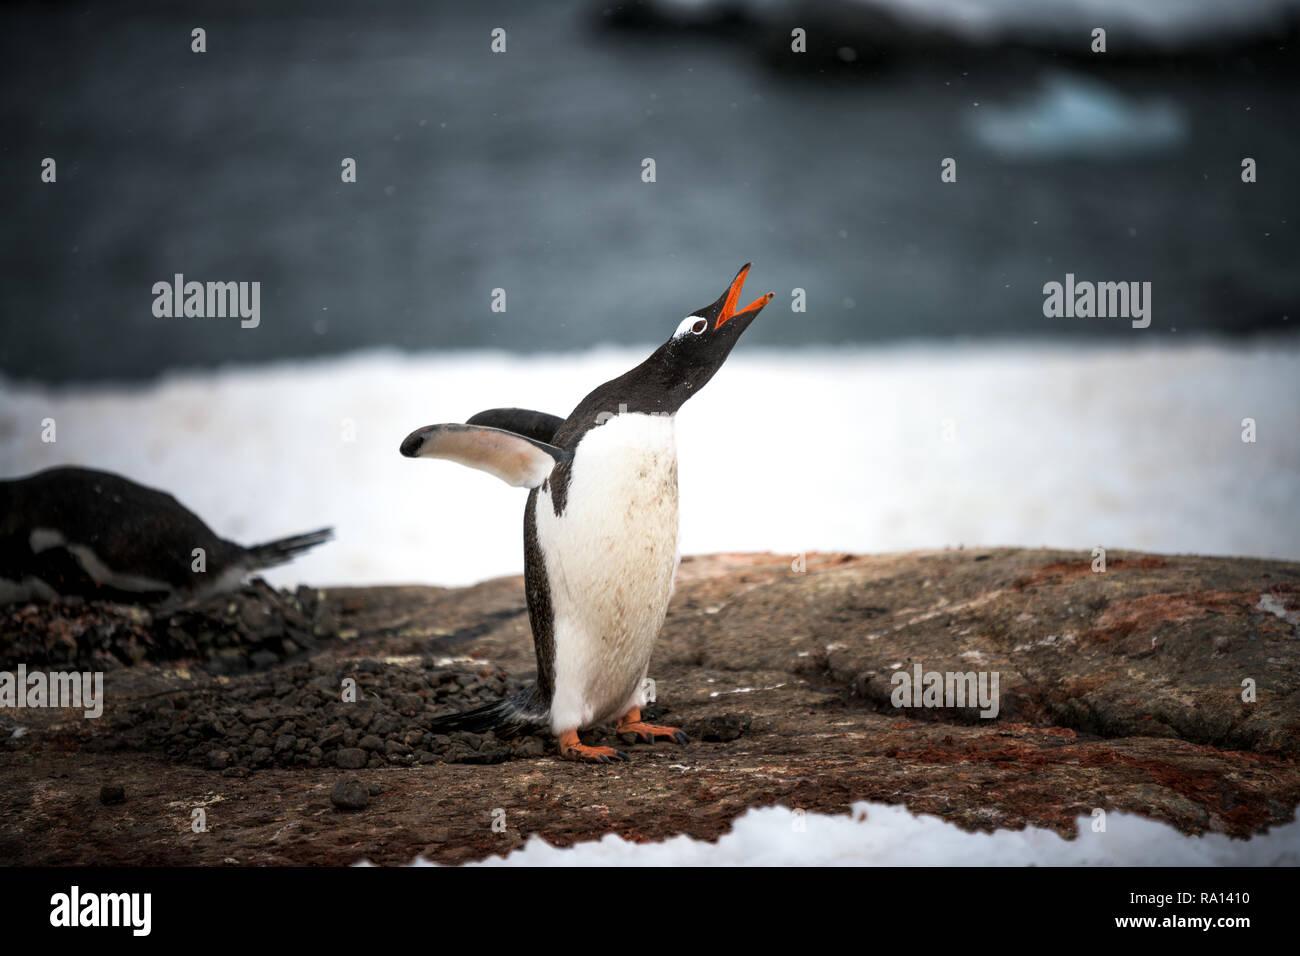 Gentoo penguin at Port Lockroy, Atnarctica - Stock Image